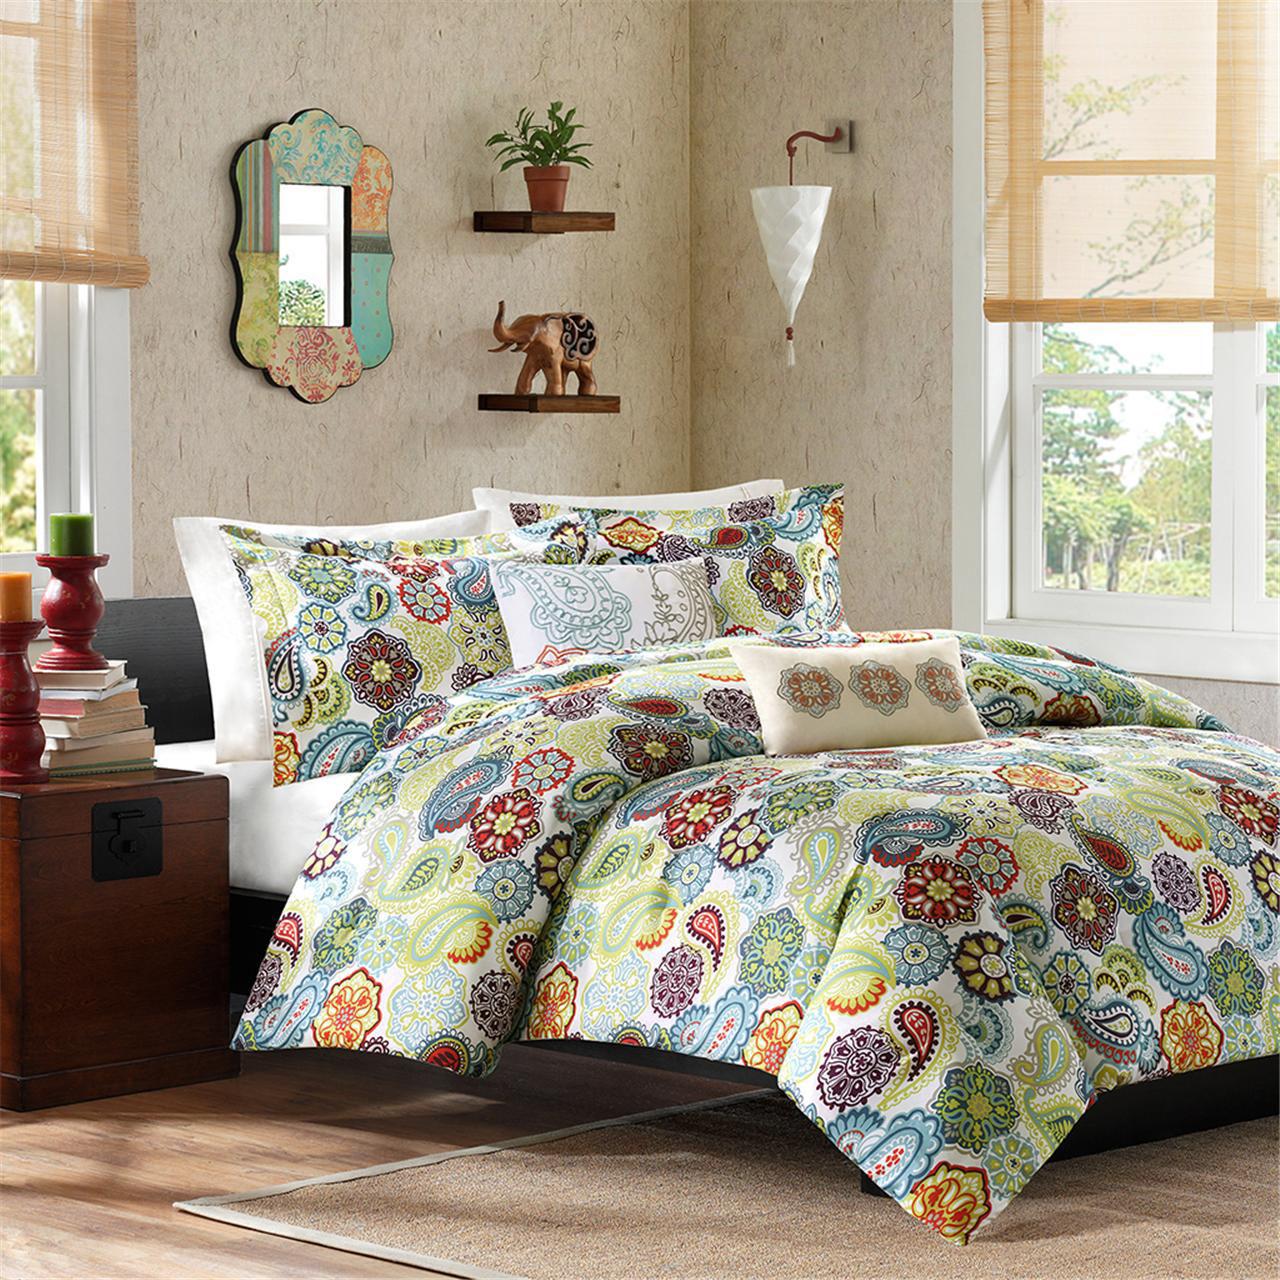 Tamil King Comforter Bedding Set